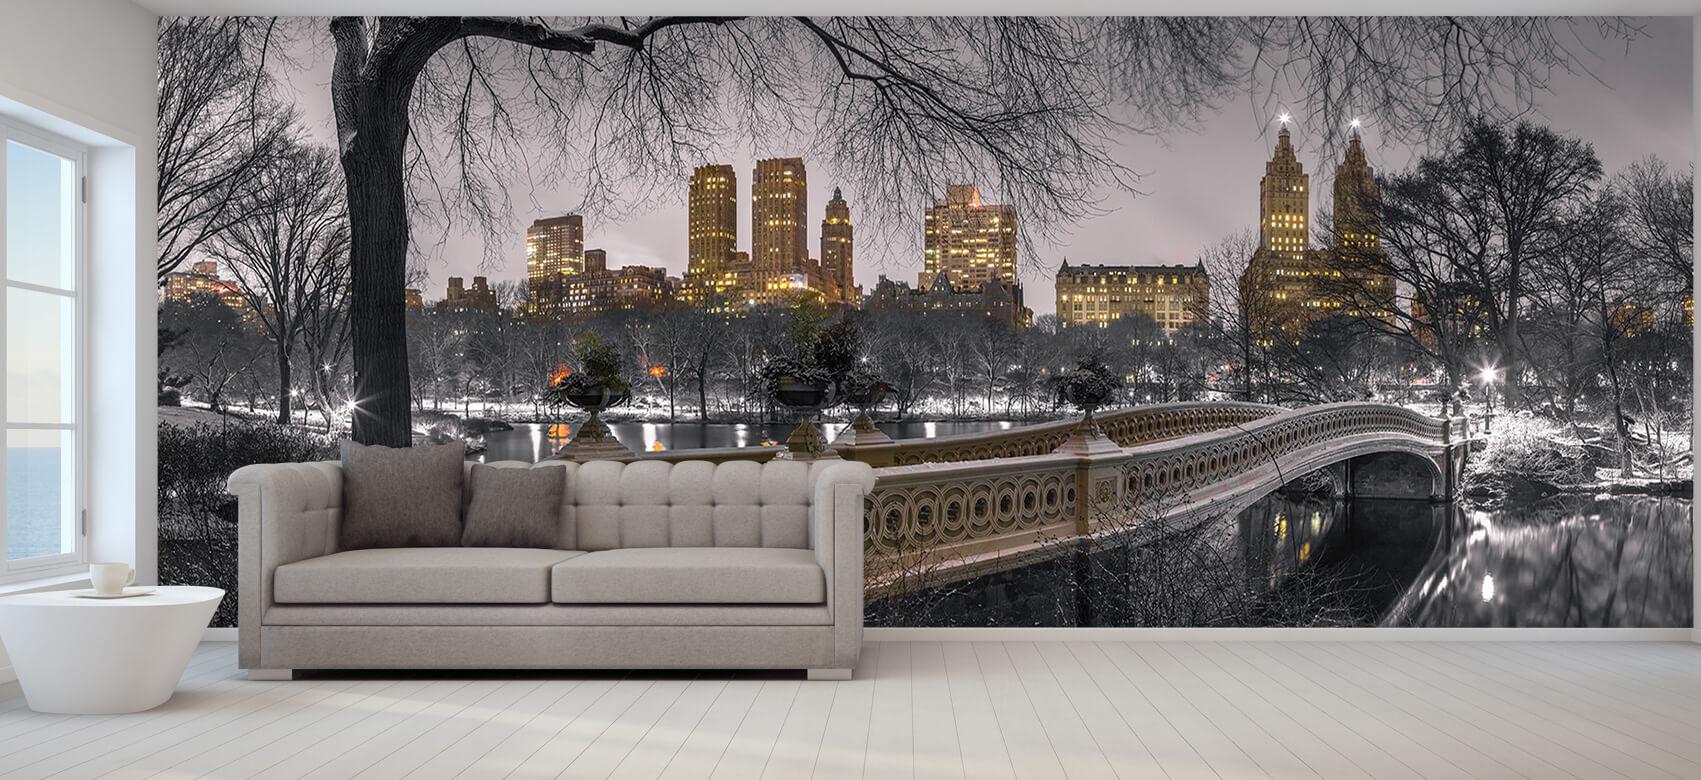 Central park and Manhattan 5